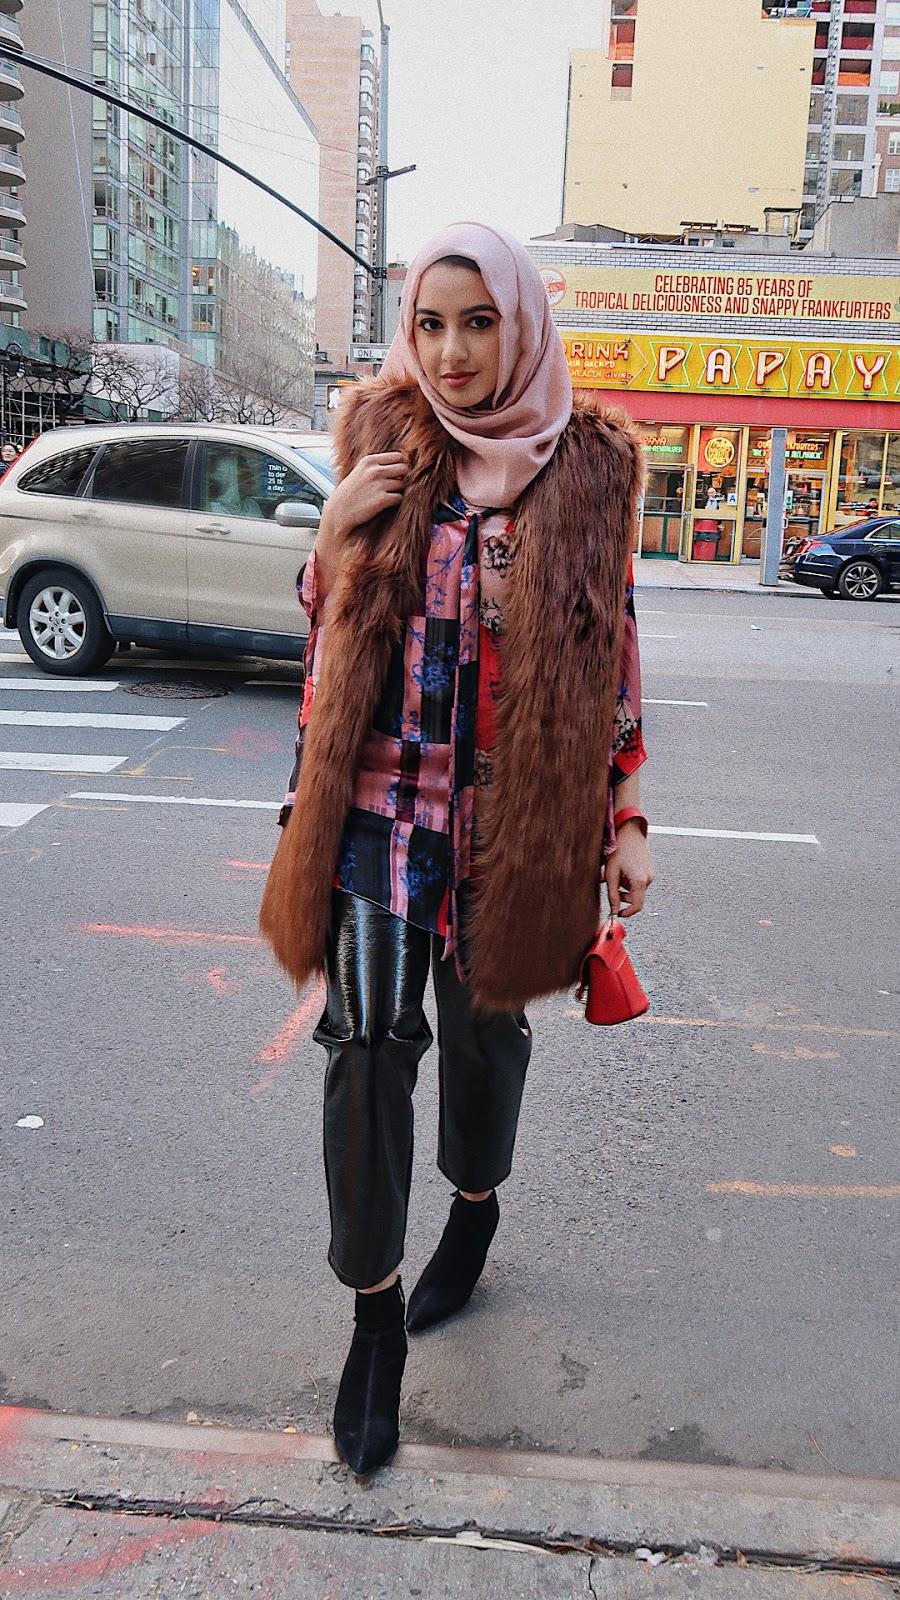 wallpaper HD muslimah cantik hijab cewek imut manis